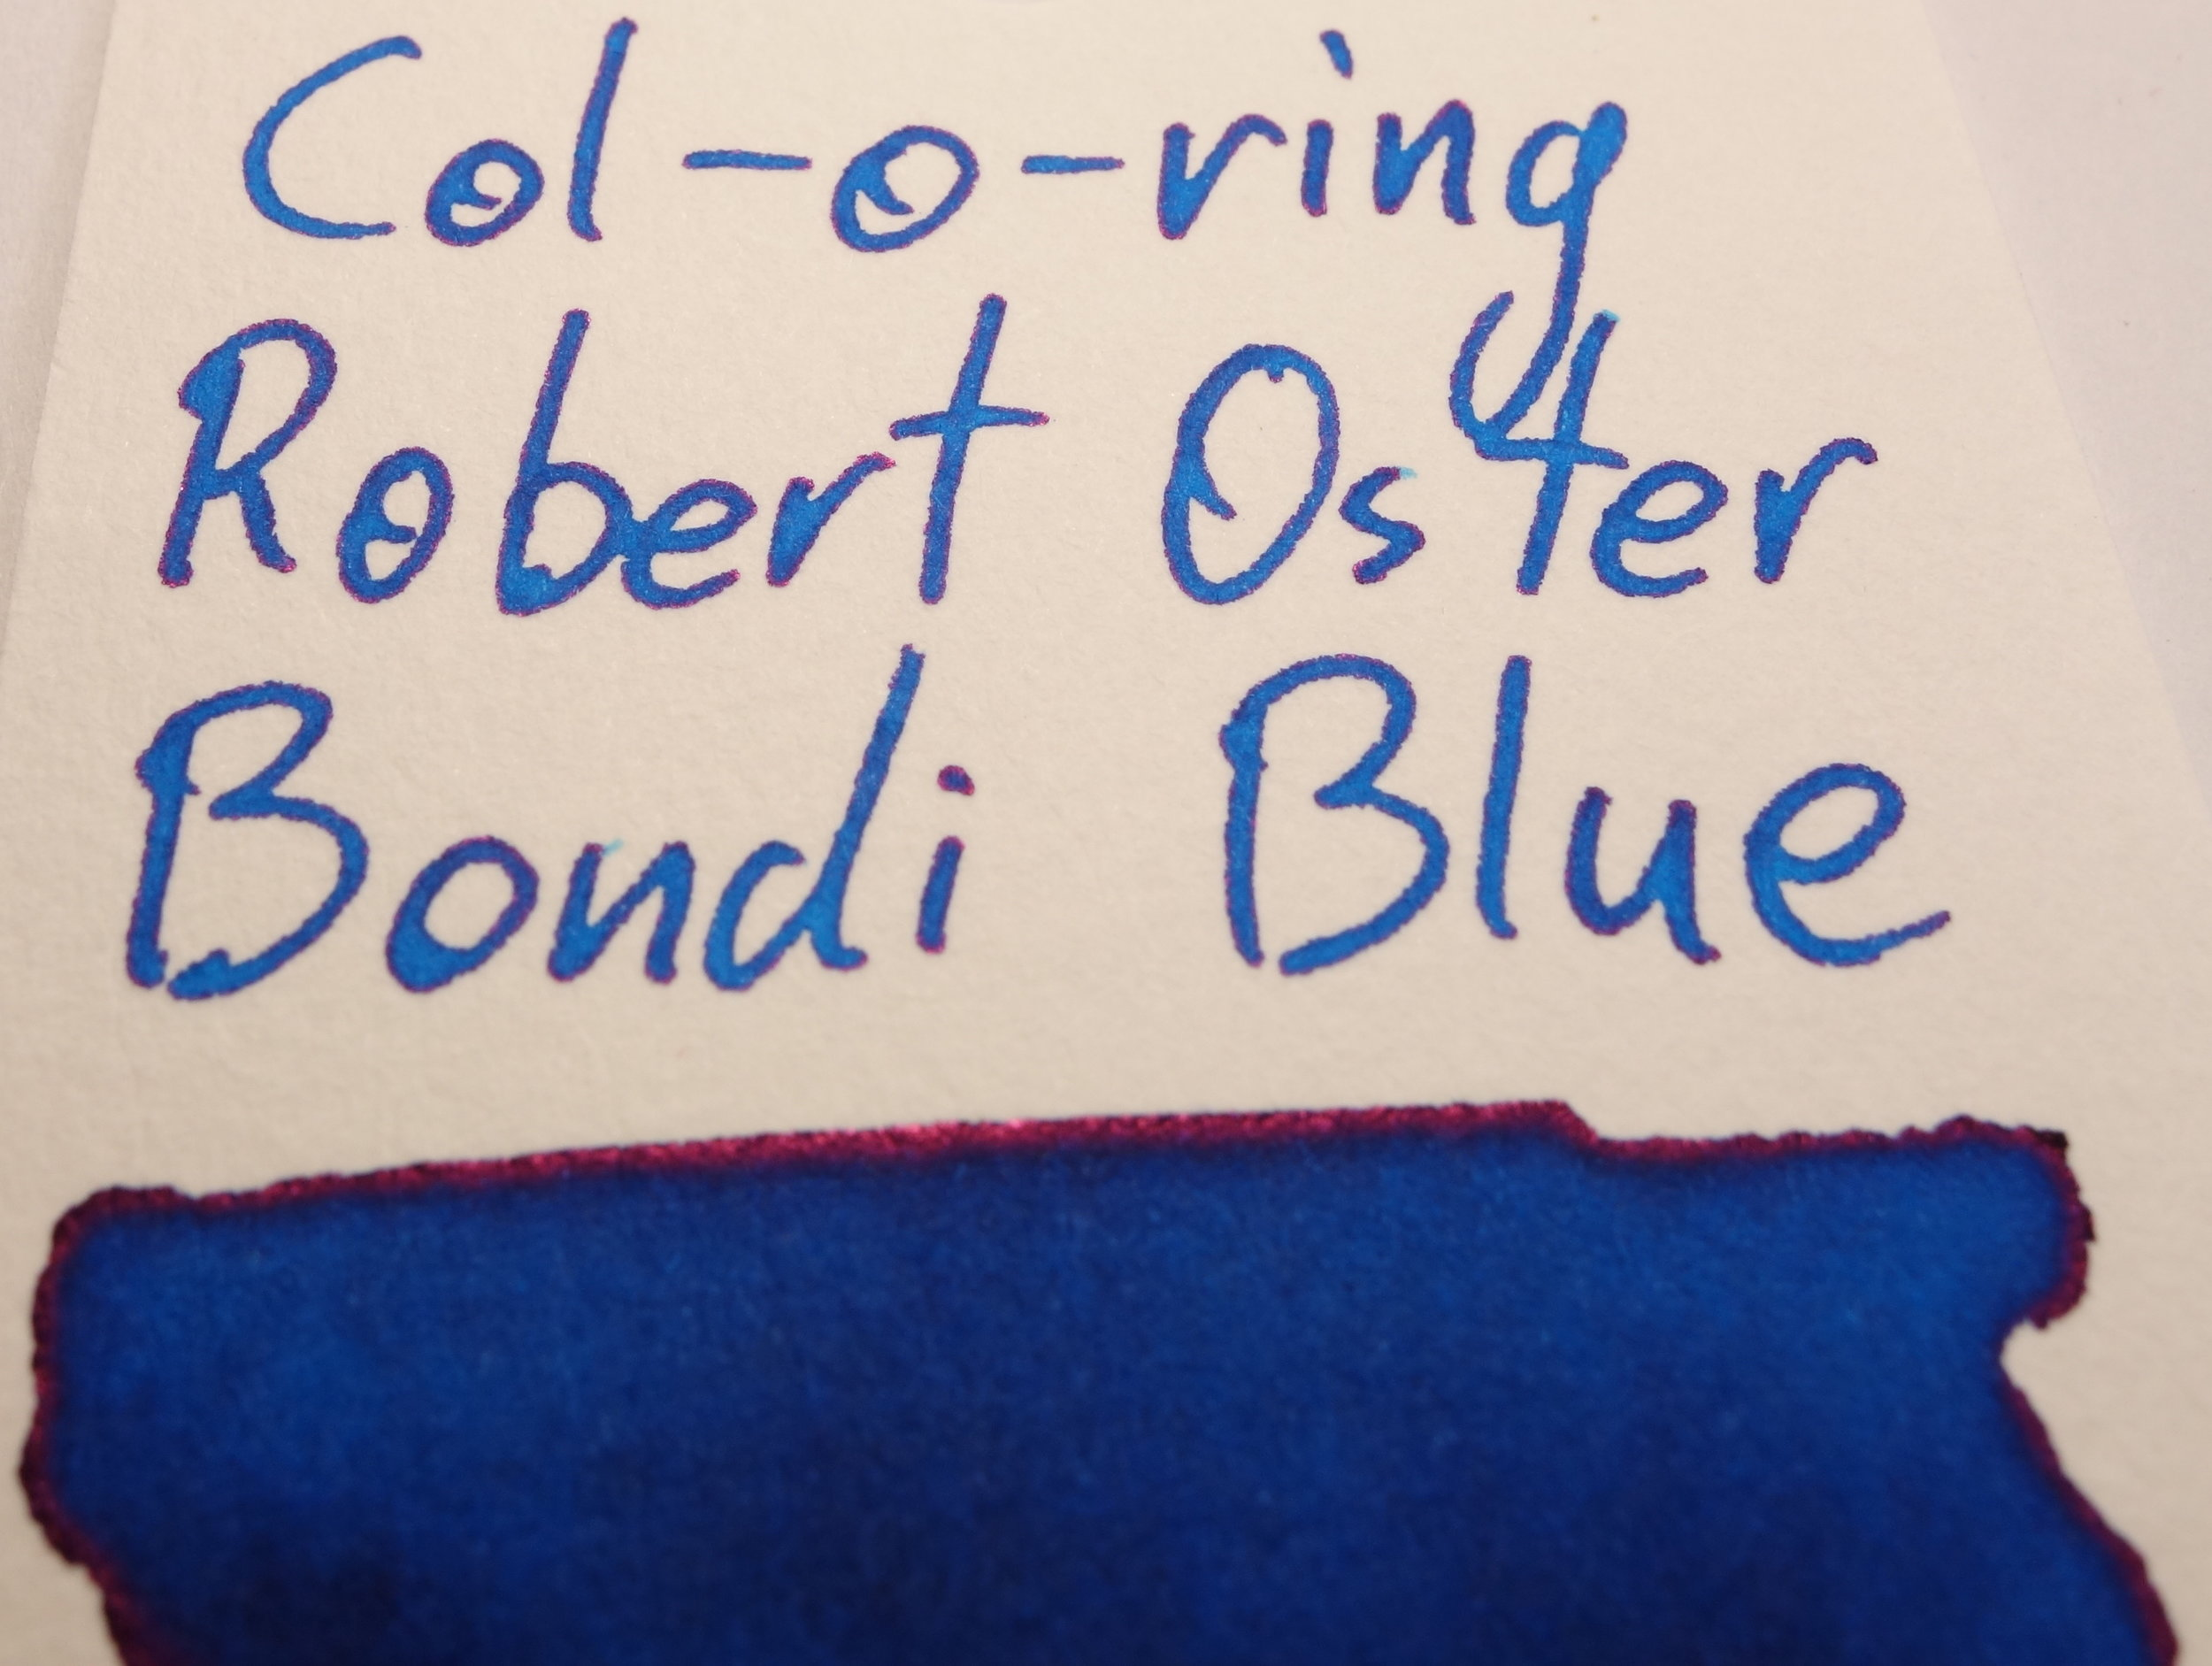 Robert Oster Bondi Blue Sheen Col-o-ring.JPG